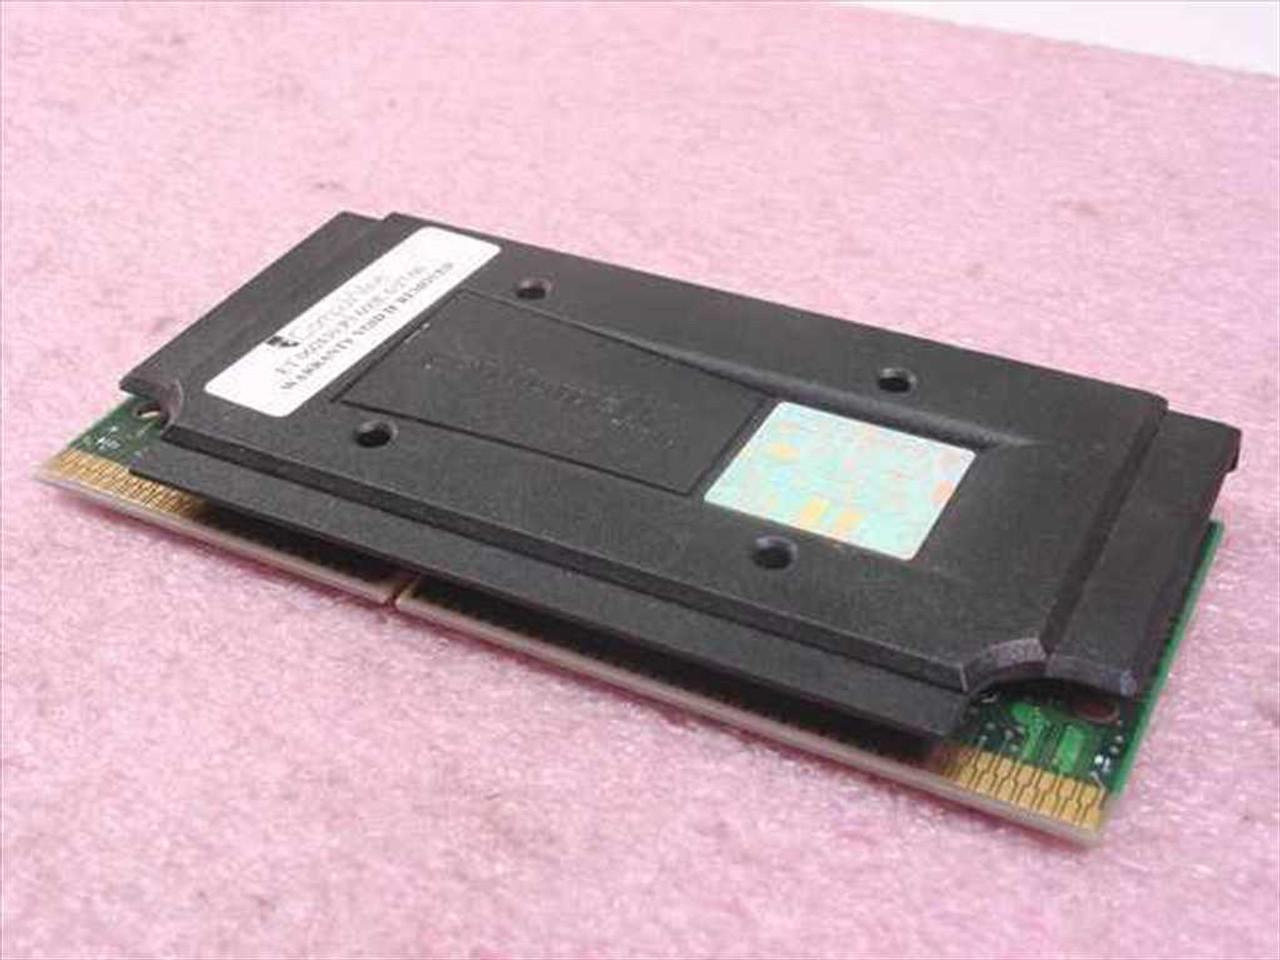 SL43E Intel Pentium III 1 Core 600MHz SECC2 Desktop Processor